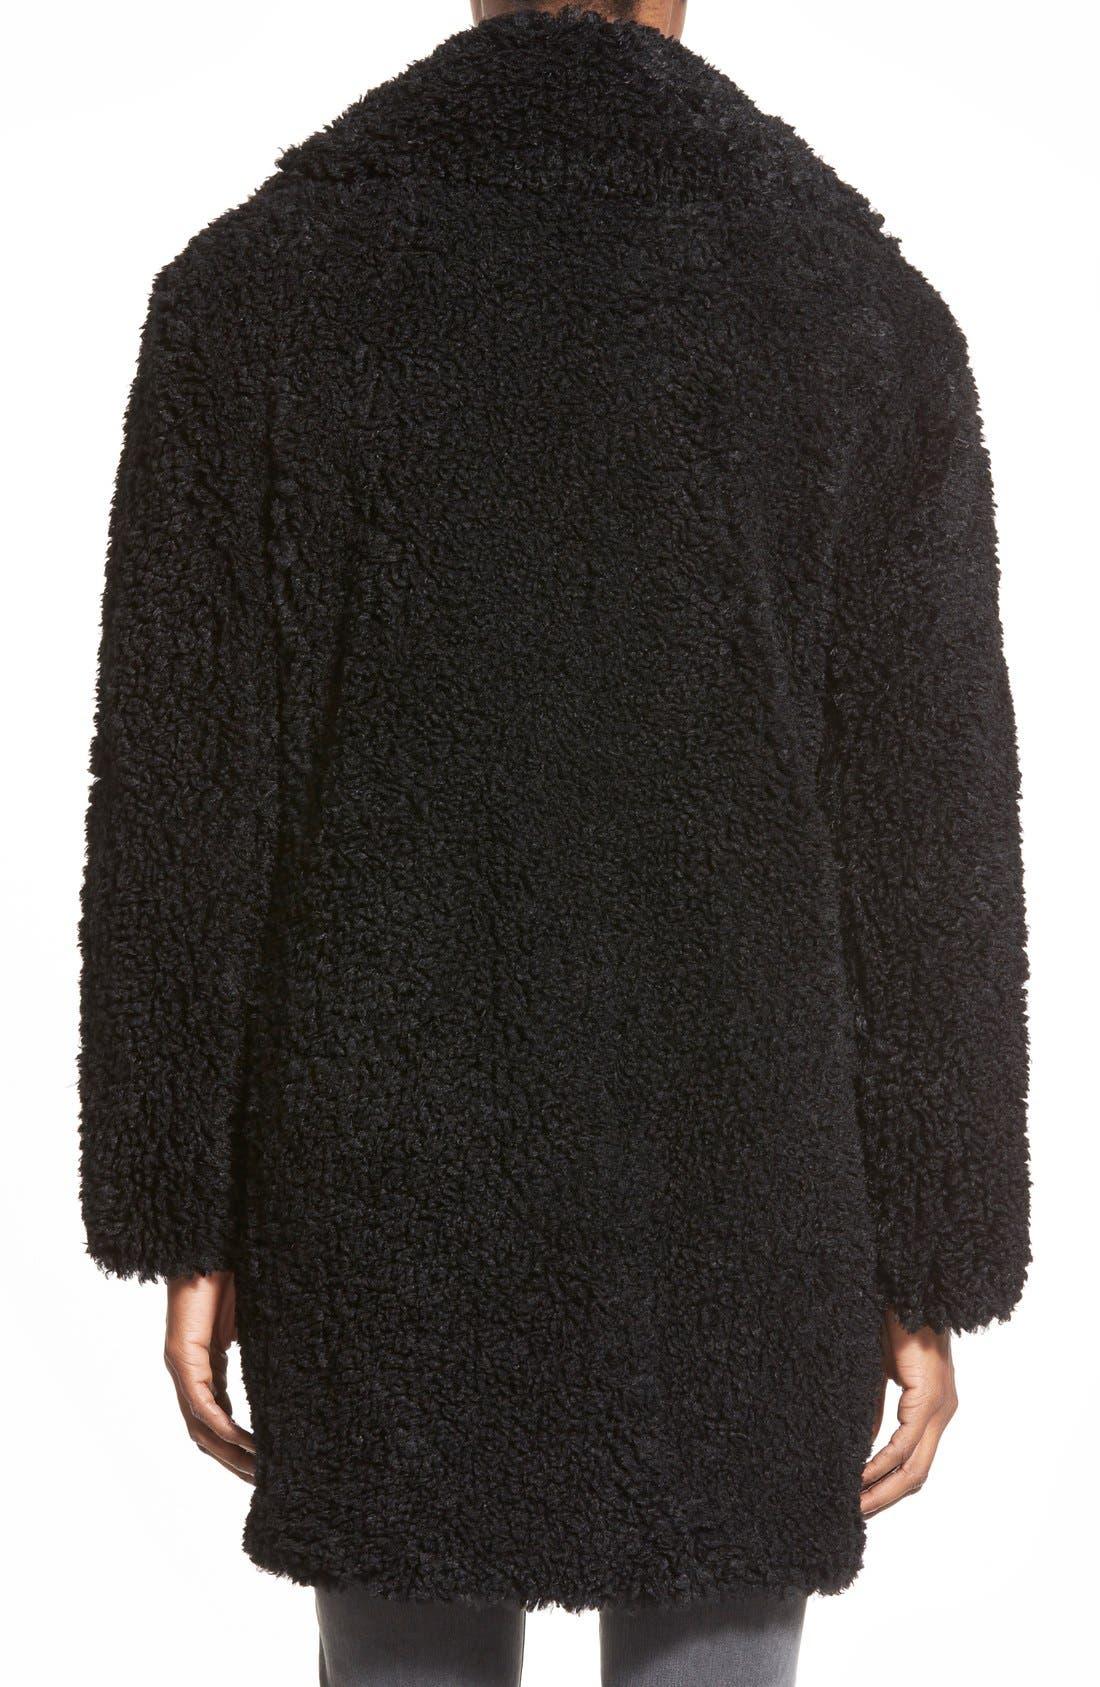 KENSIE,                             'Teddy Bear' Notch Collar Reversible Faux Fur Coat,                             Alternate thumbnail 2, color,                             001